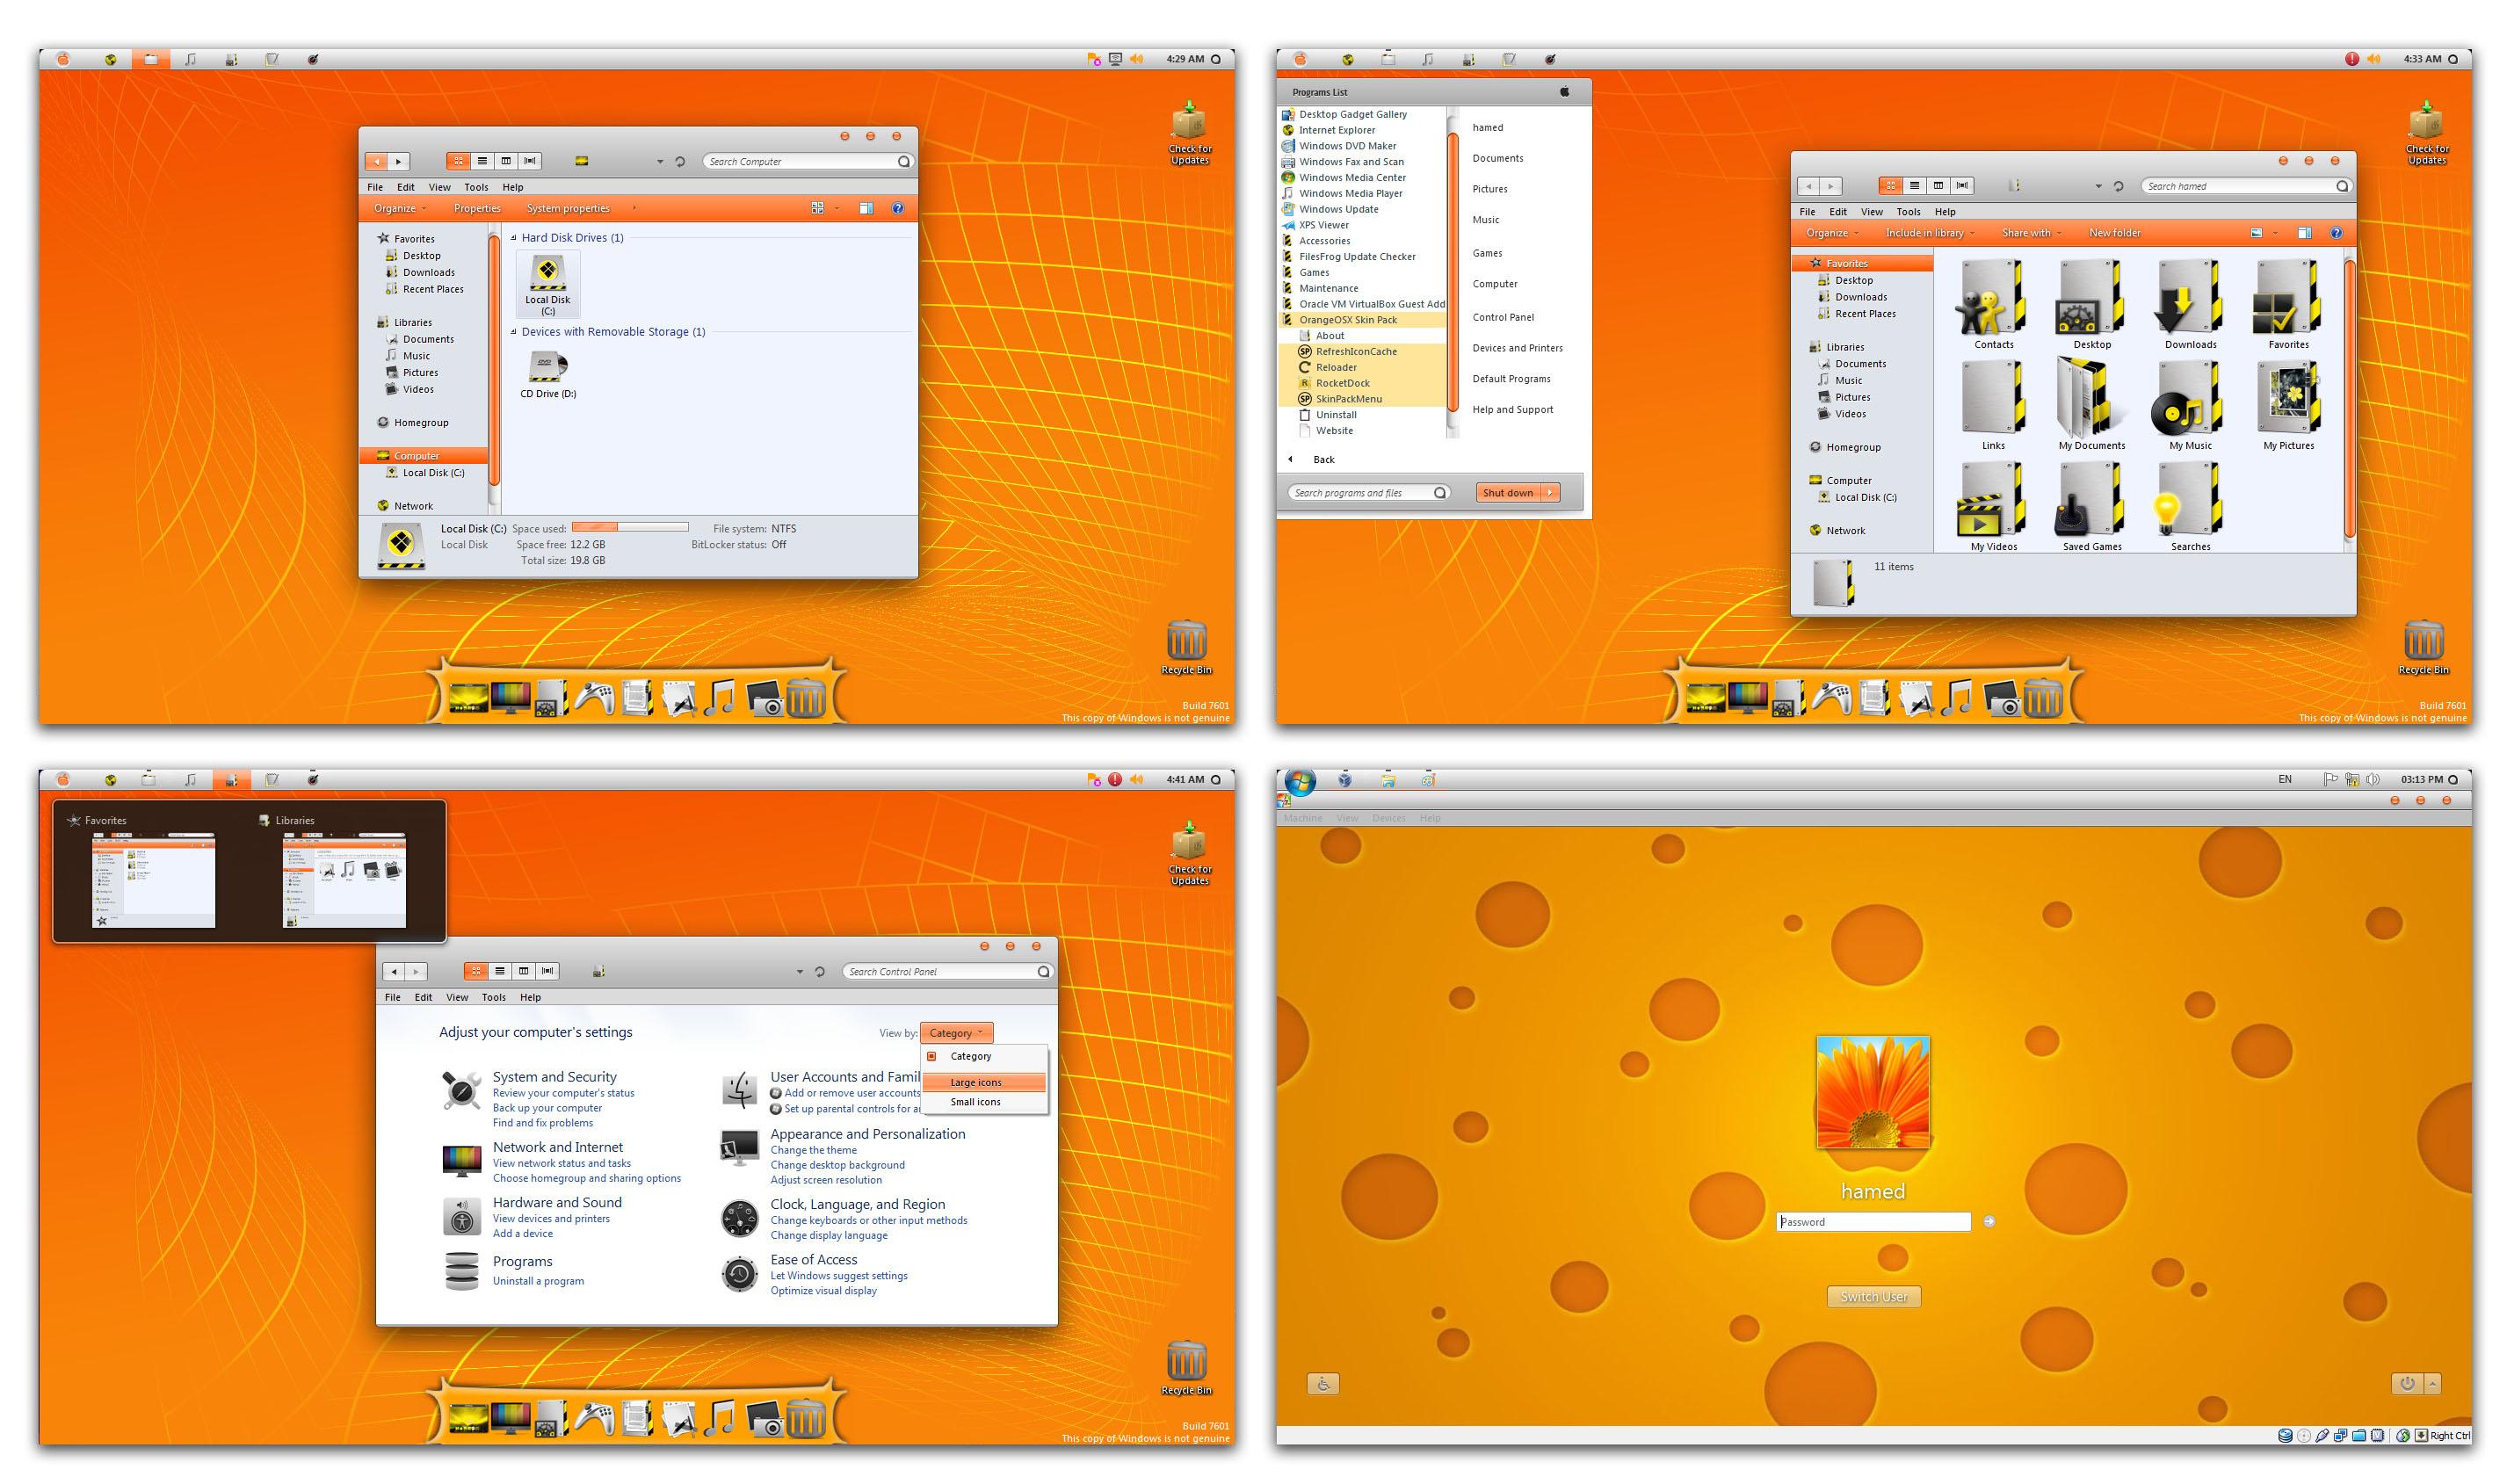 OrangeOSX Skin Pack | pchealthtools